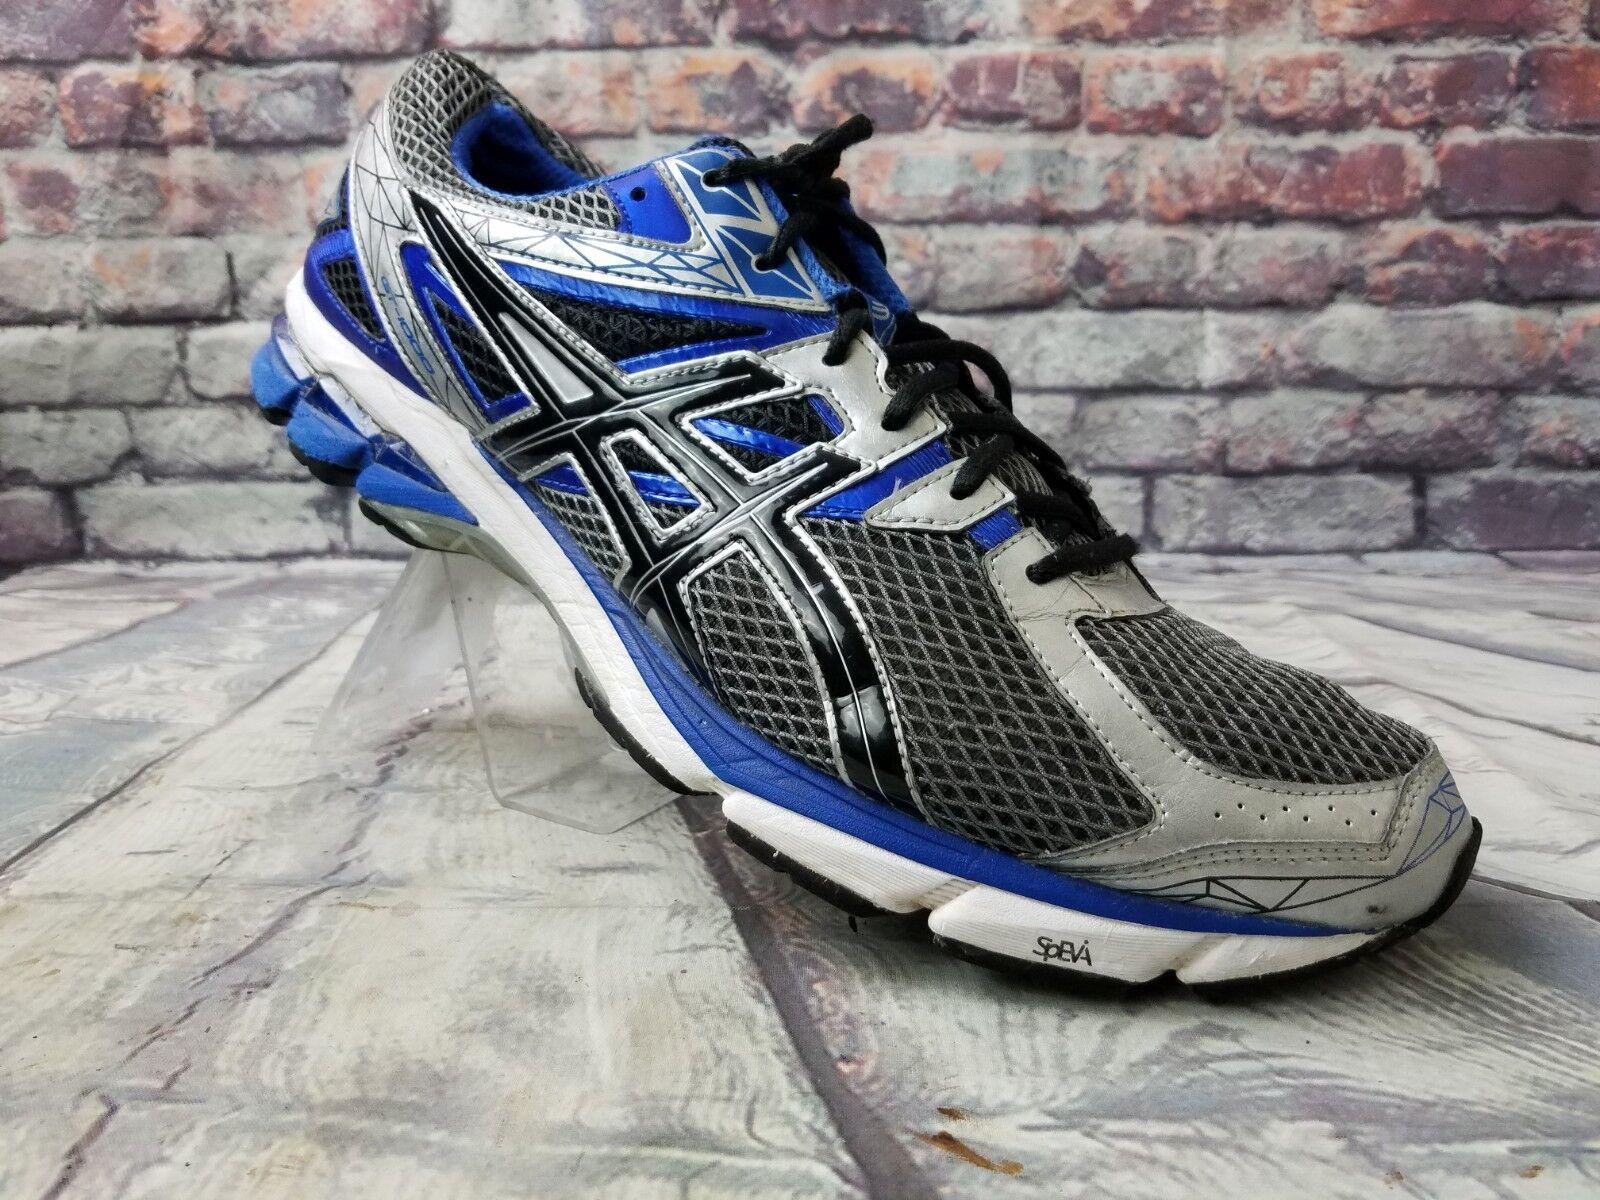 Asics GT 1000 3 Mens shoes T4K3N 9190 bluee Silver Black athletic Sz 15 M